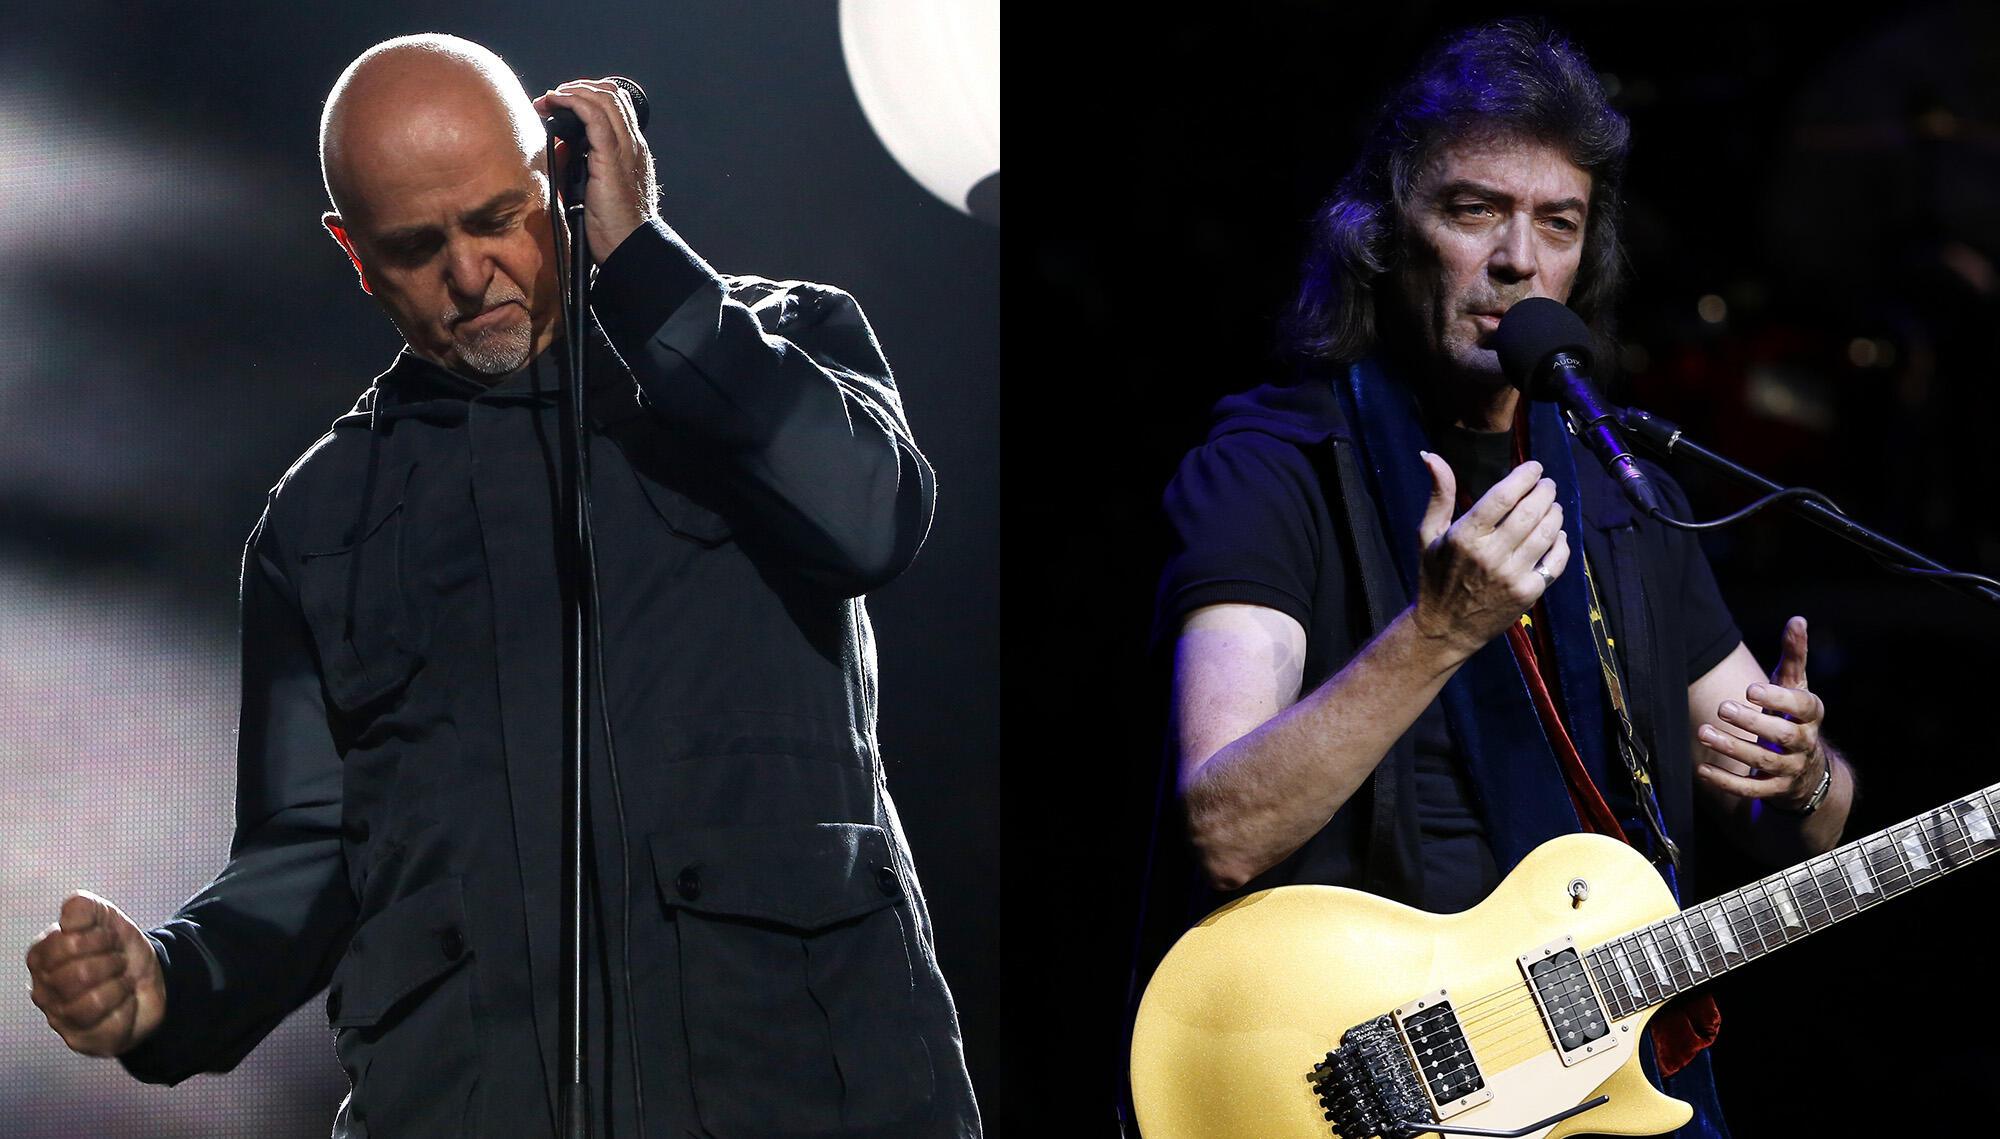 Genesis Reunion With Peter Gabriel, Steve Hackett Would Be 'Uphill' Effort